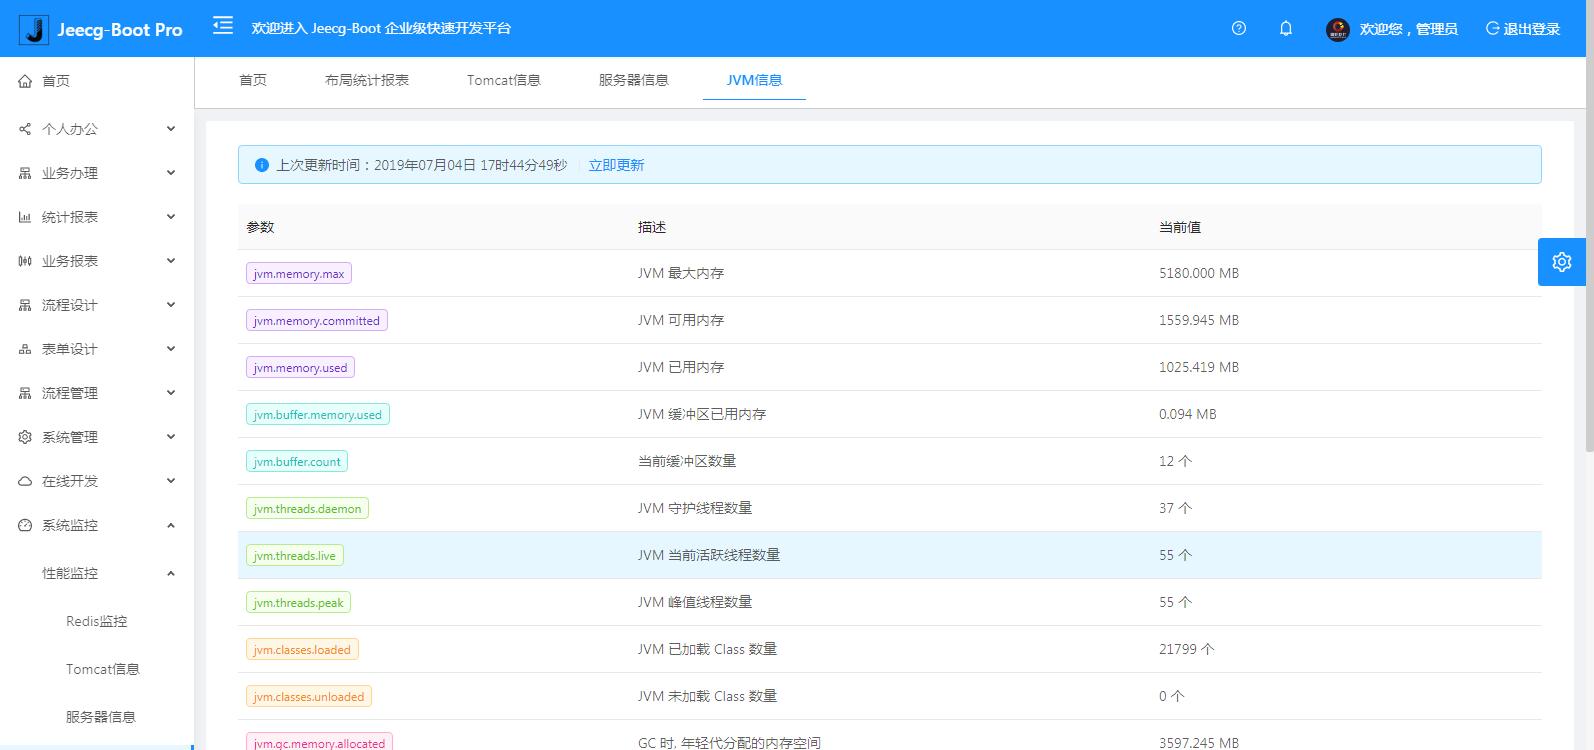 JeecgBoot 2.4.3版本发布,企业级低代码平台(图12)